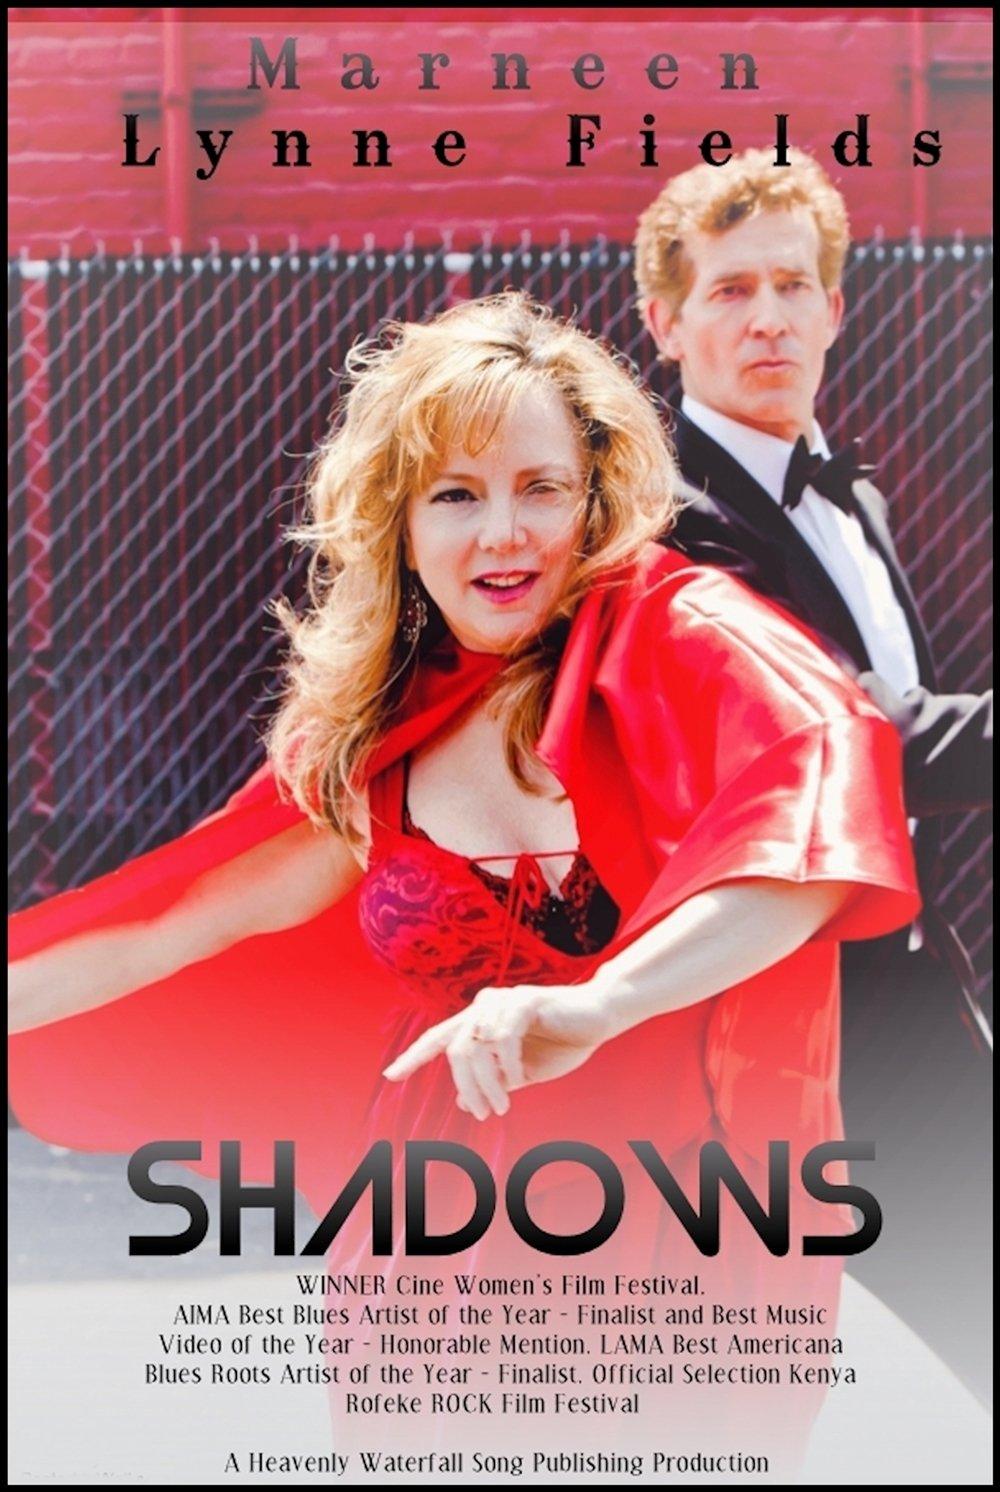 Shadows by Marneen Lynne Fields (ASCAP) | ReverbNation